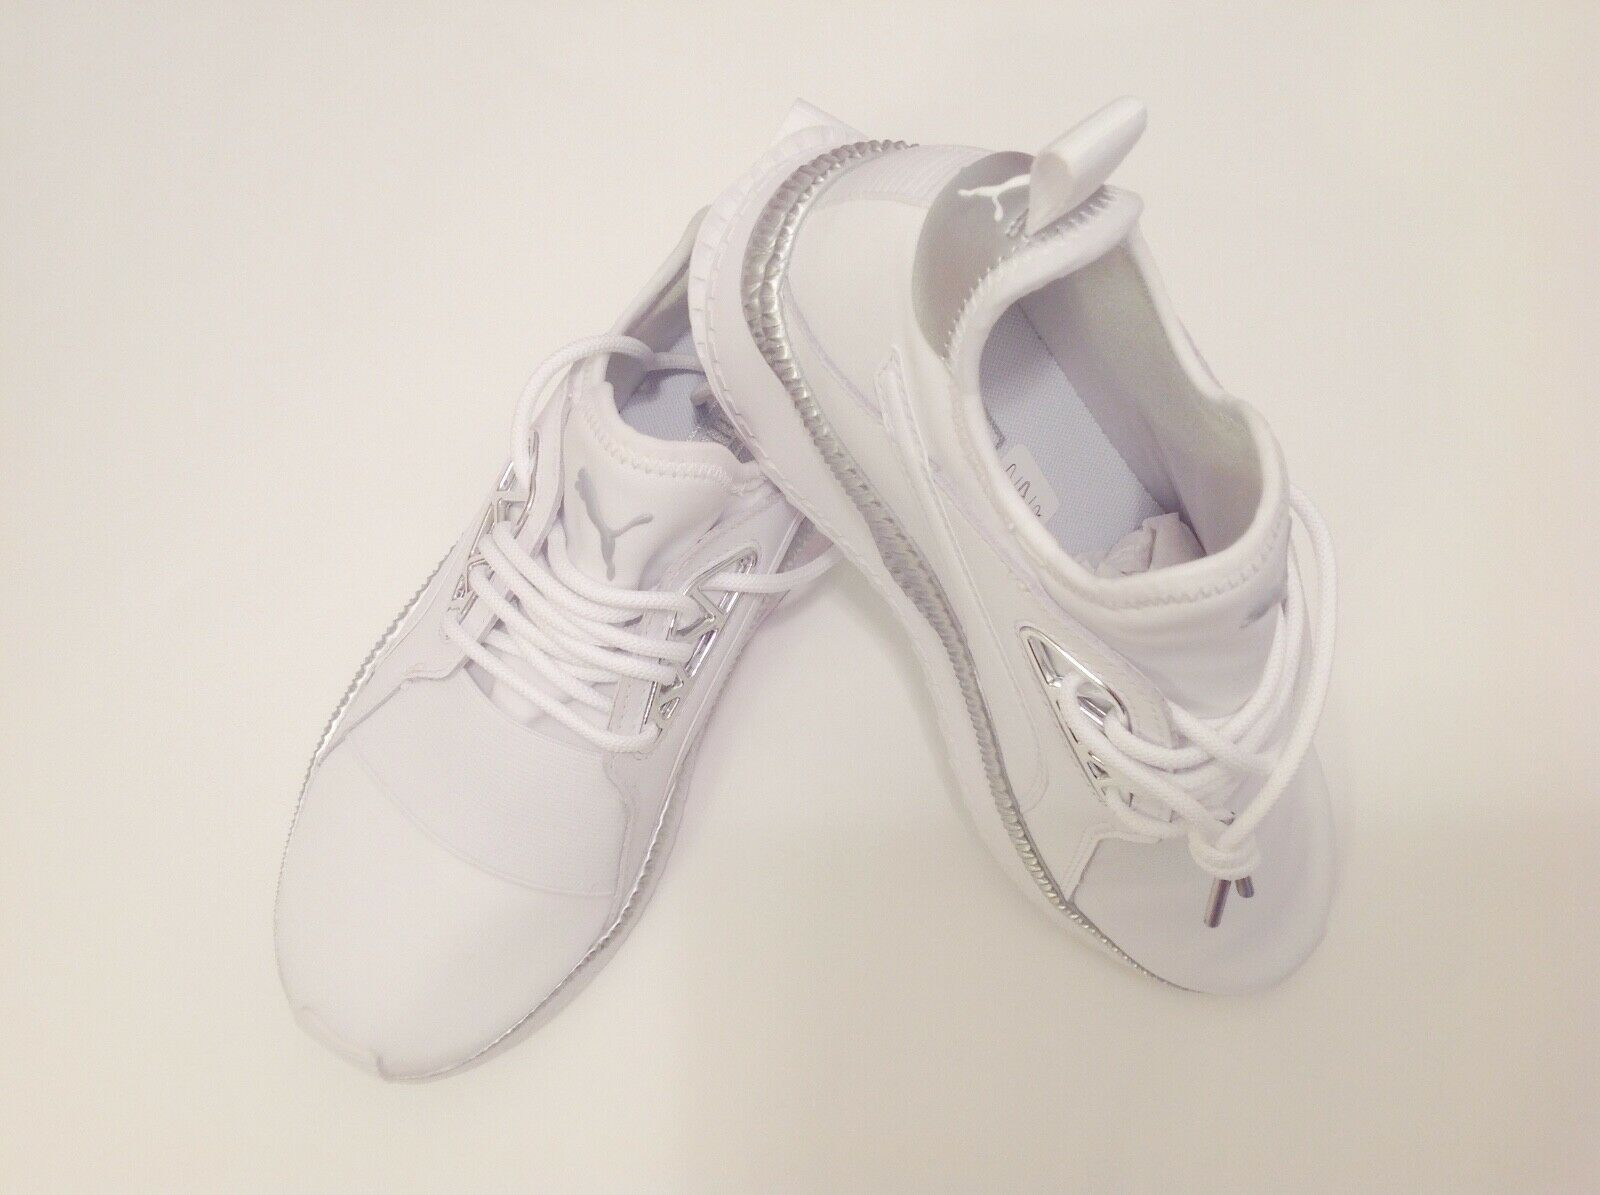 Puma 366756 02 Tsugi Apex Jewel Puma White Women's shoes